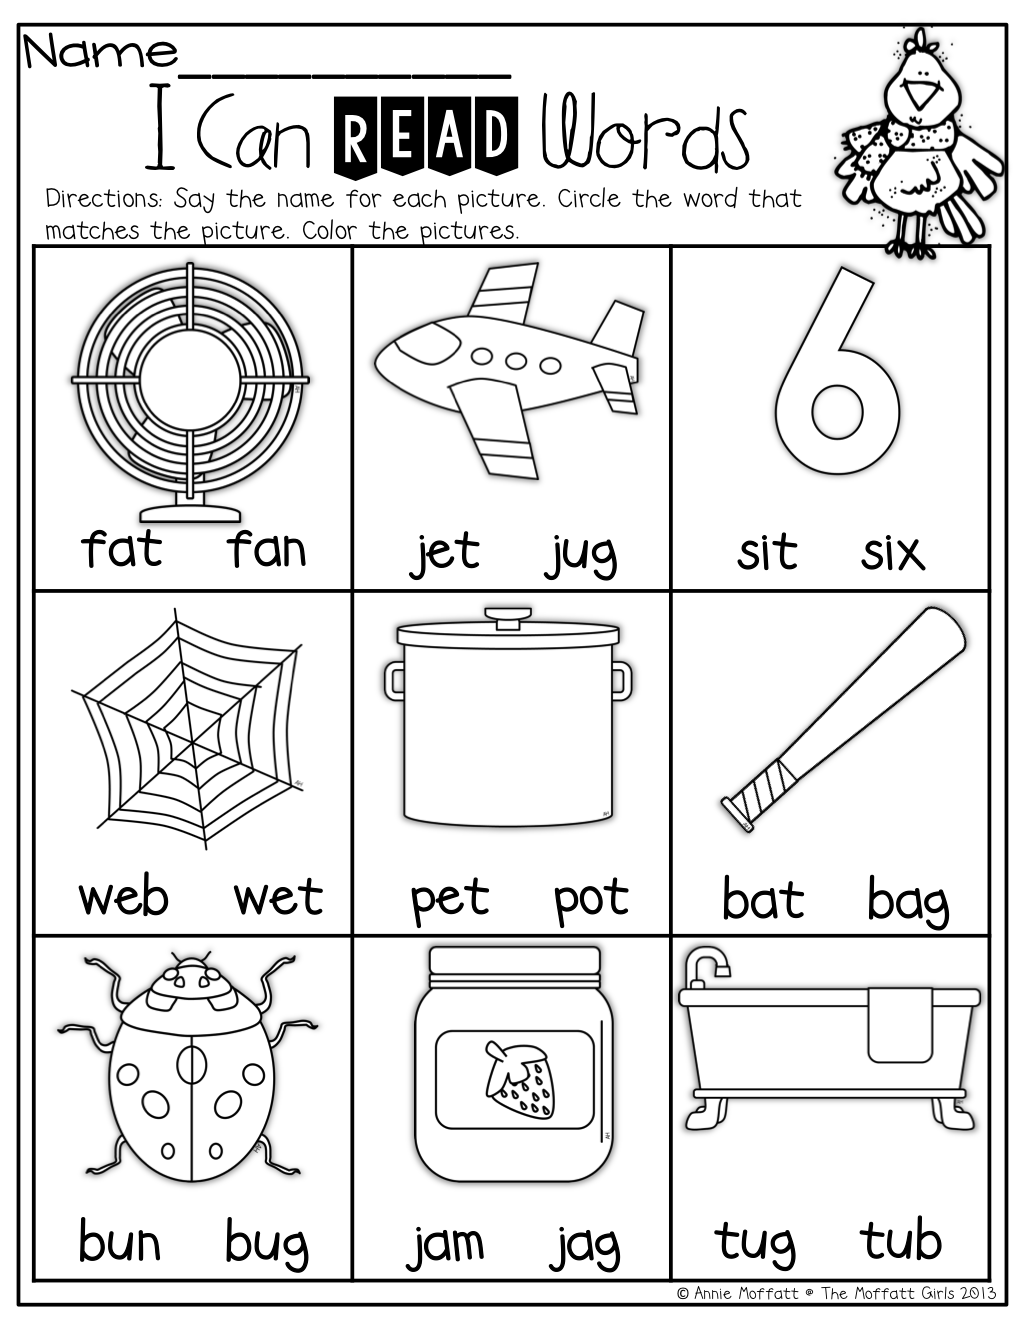 I Can Read Words Word Family Kindergarten Worksheets Preschool Phonics Kindergarten Kindergarten Reading Kindergarten Phonics Worksheets [ 1325 x 1024 Pixel ]